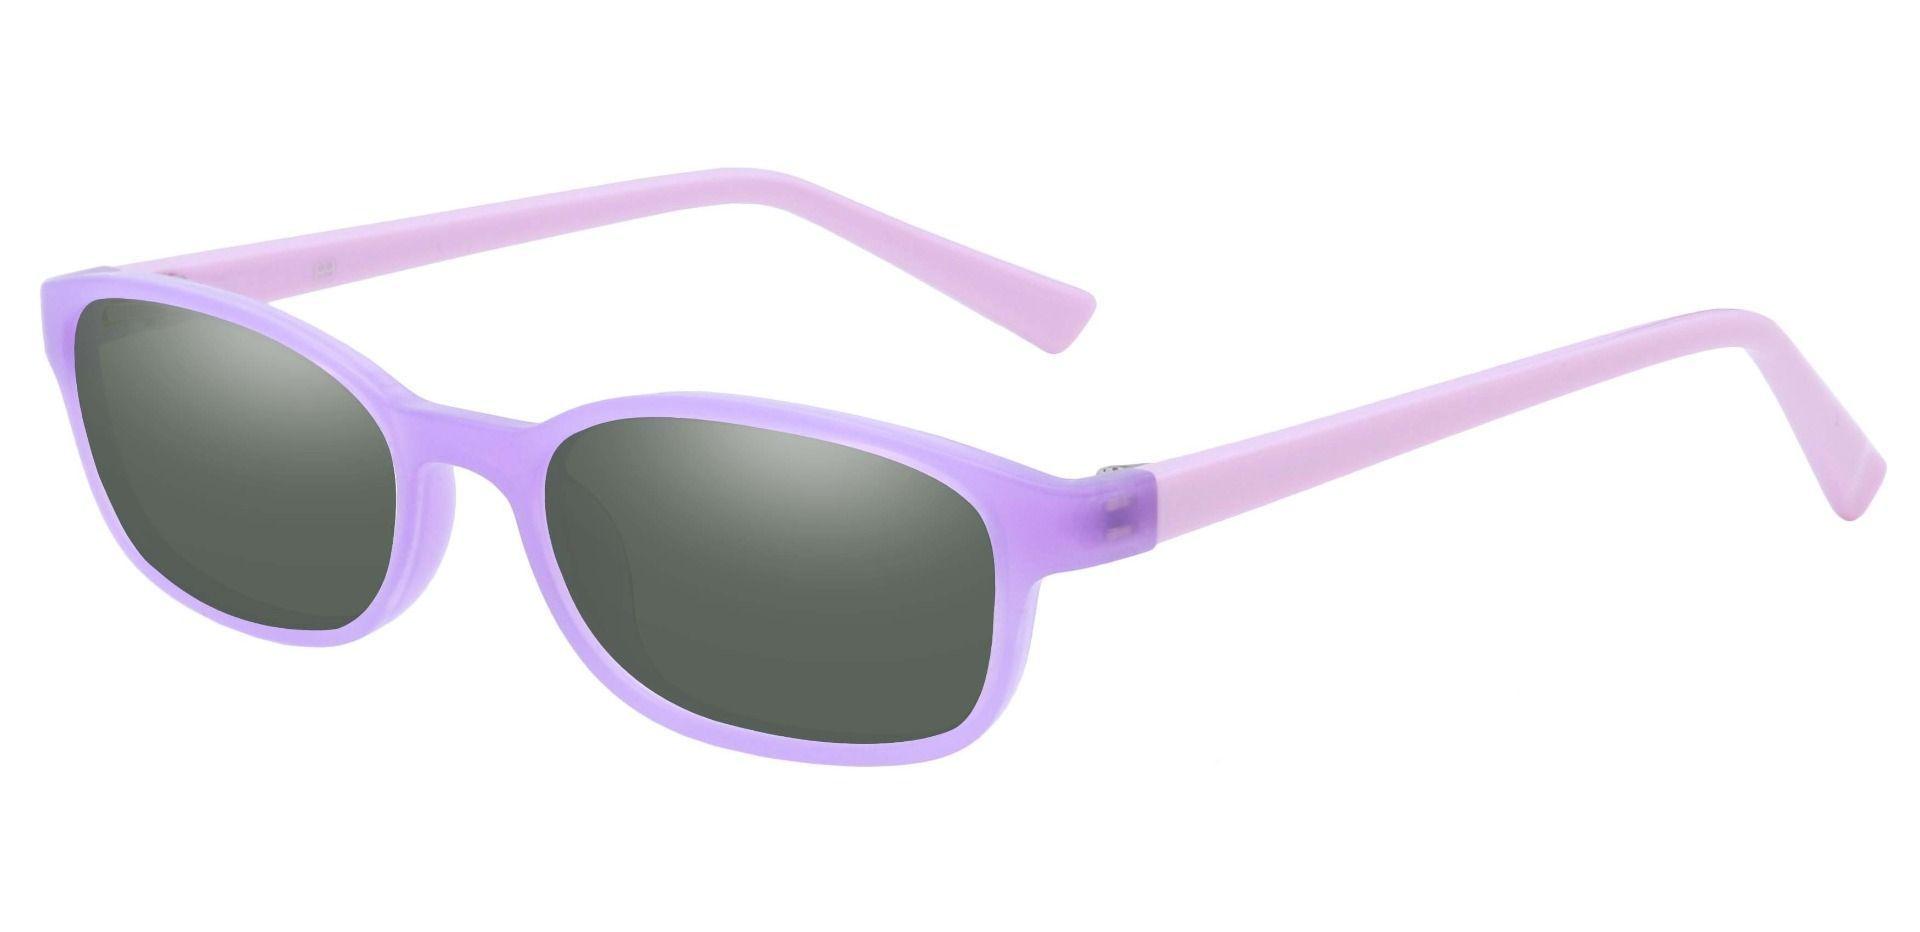 Kia Oval Single Vision Sunglasses -  Purple Frame With Green Lenses